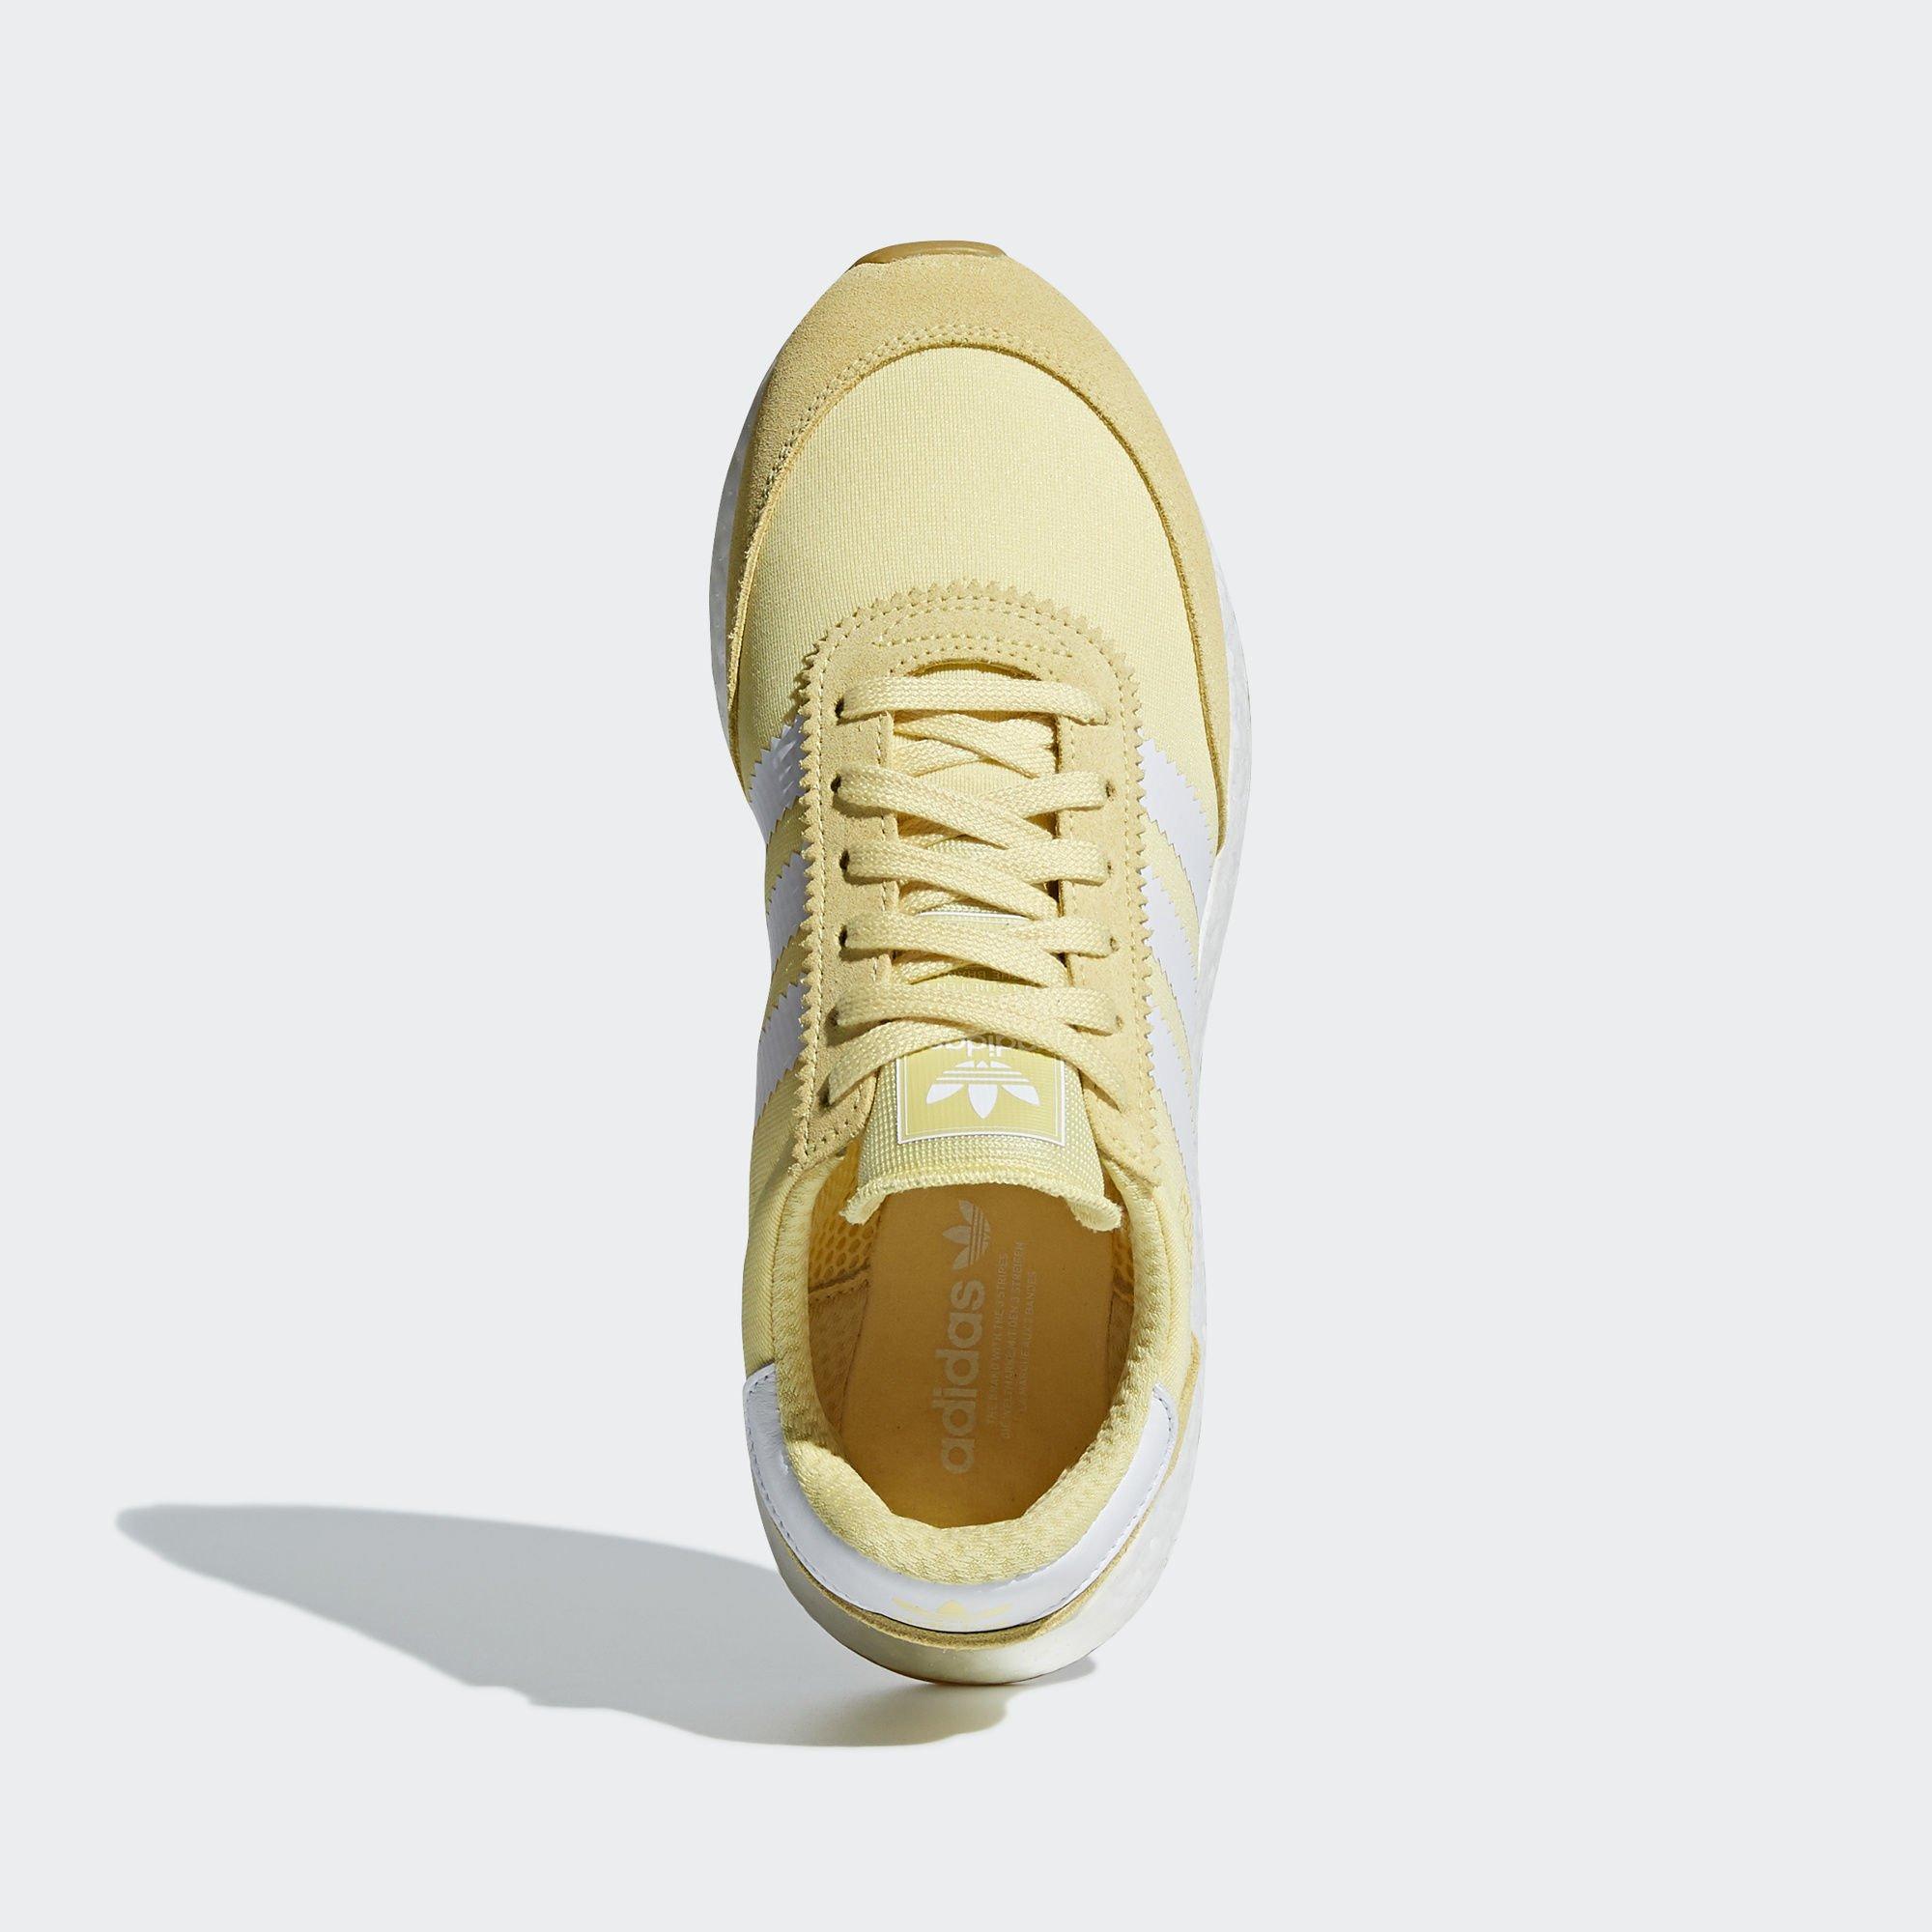 adidas I-5923 'Clear Yellow' (B37972)